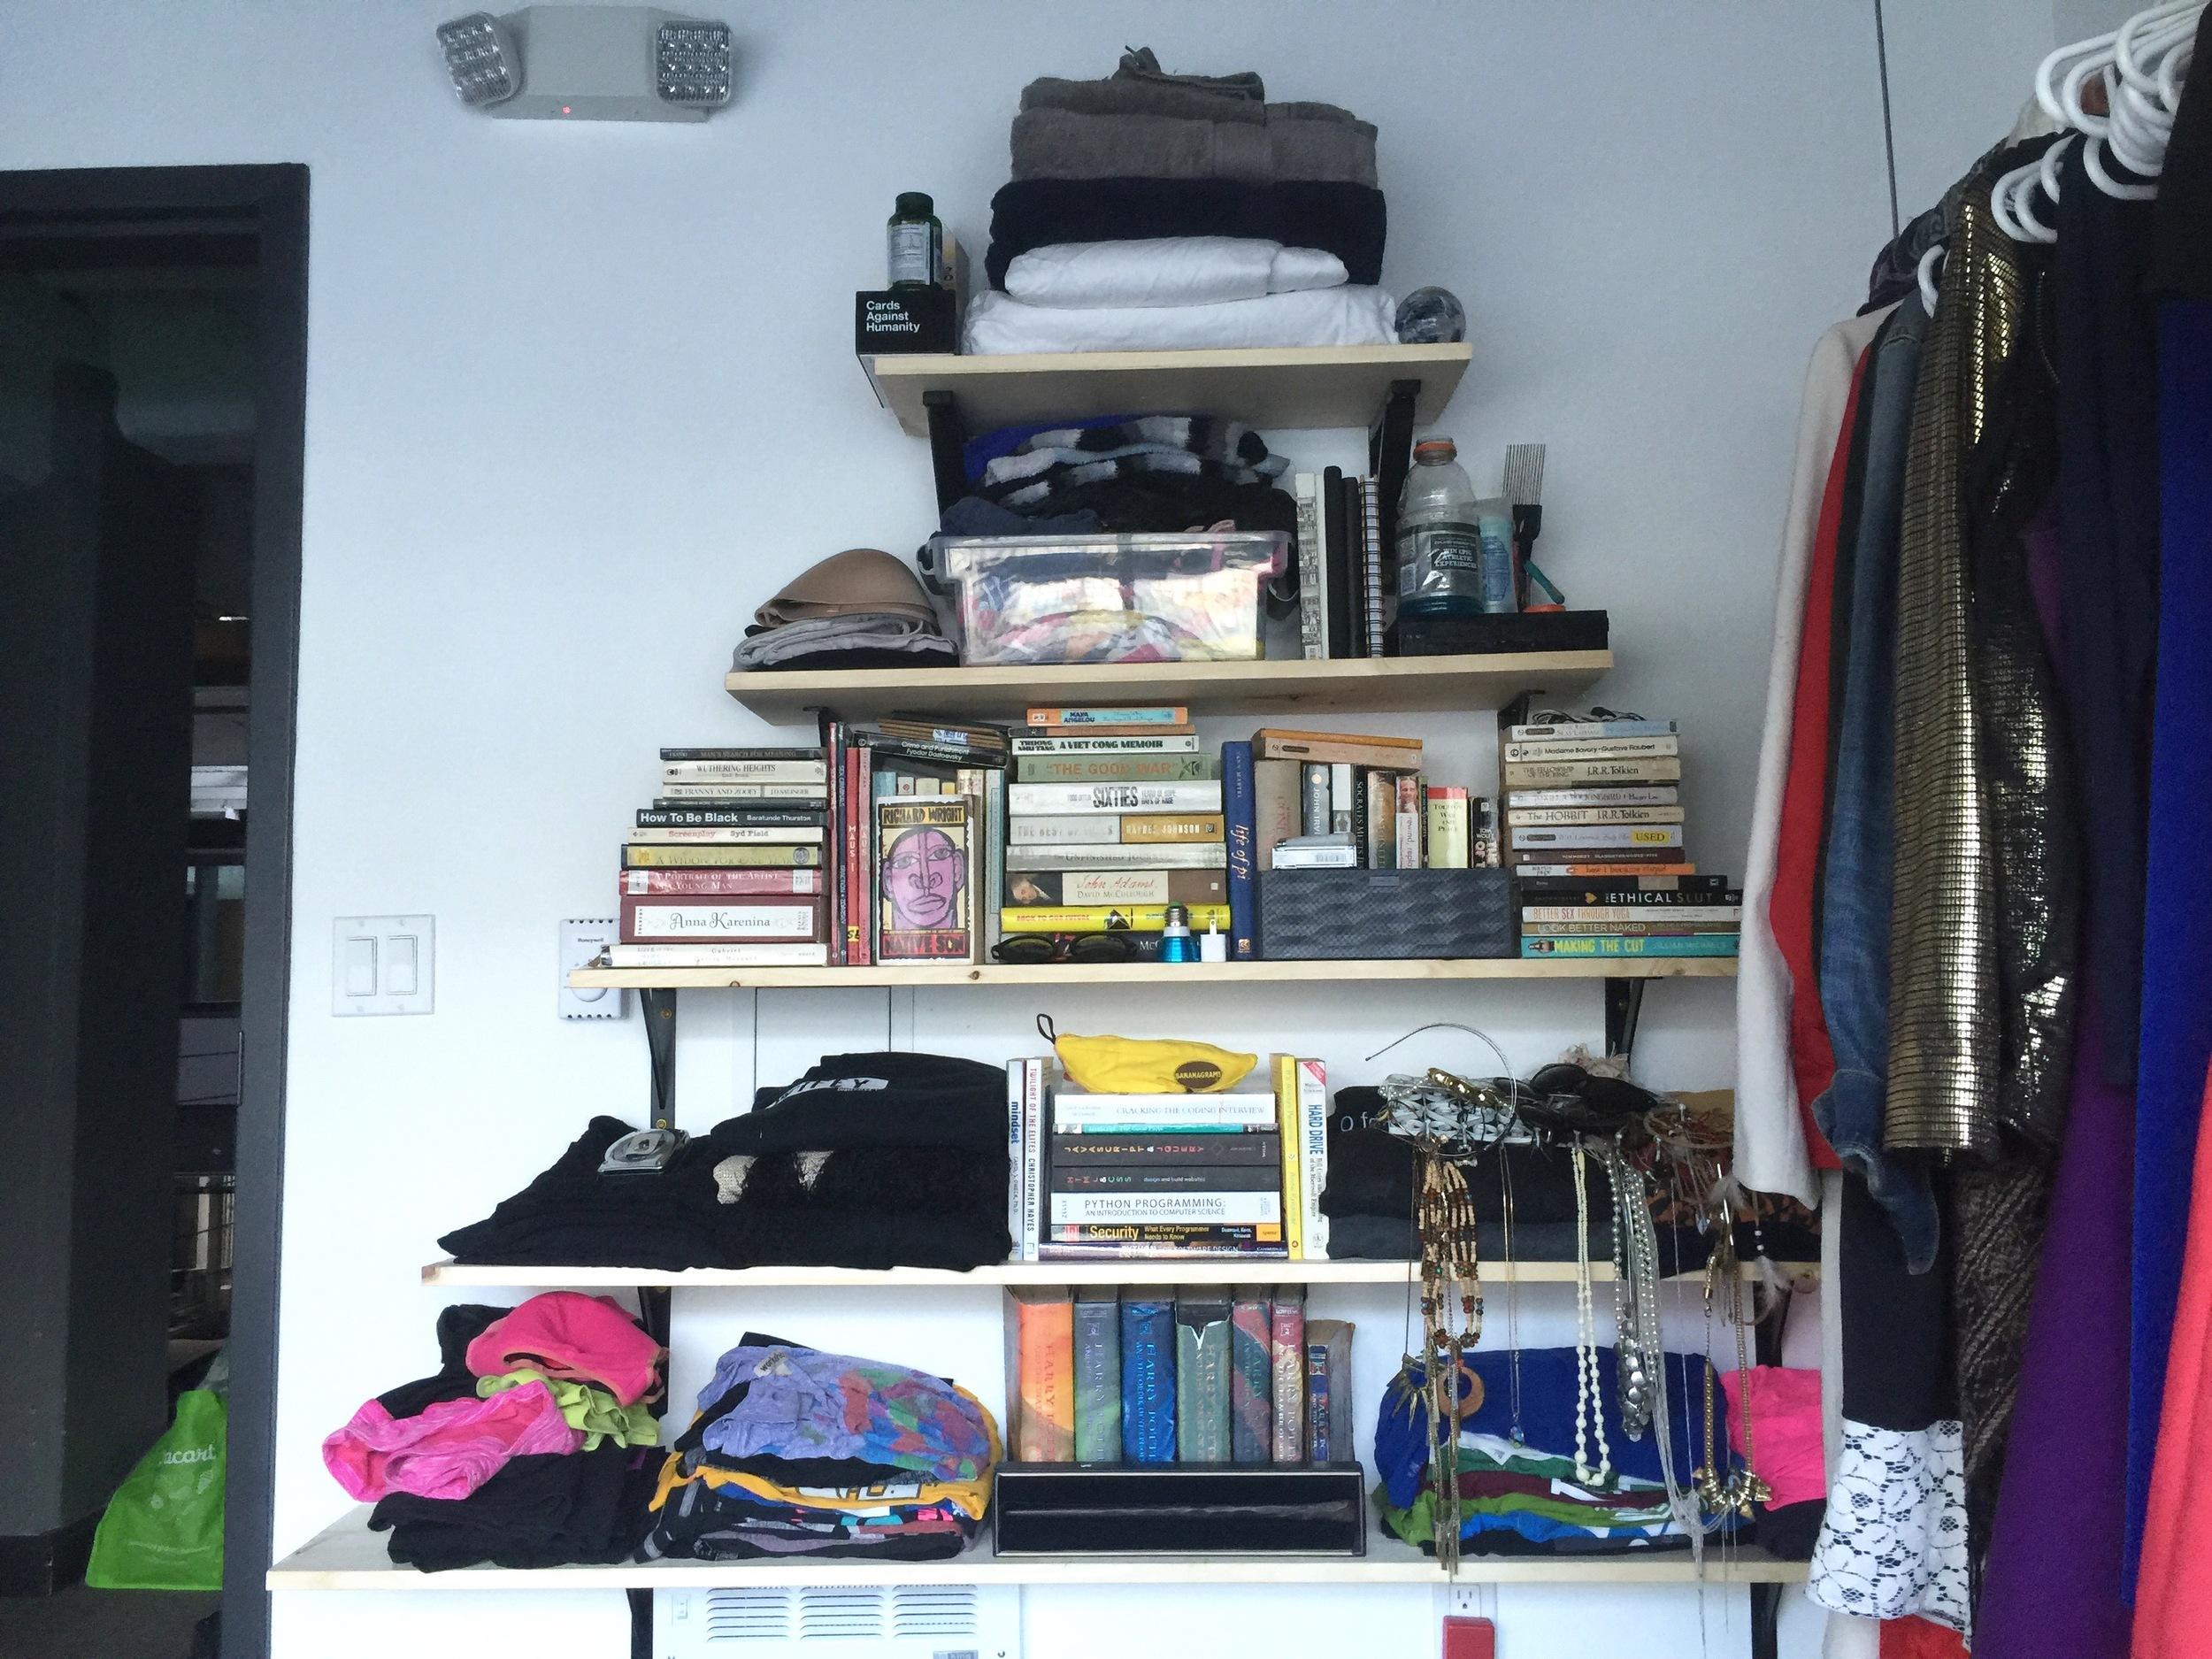 Filled shelves